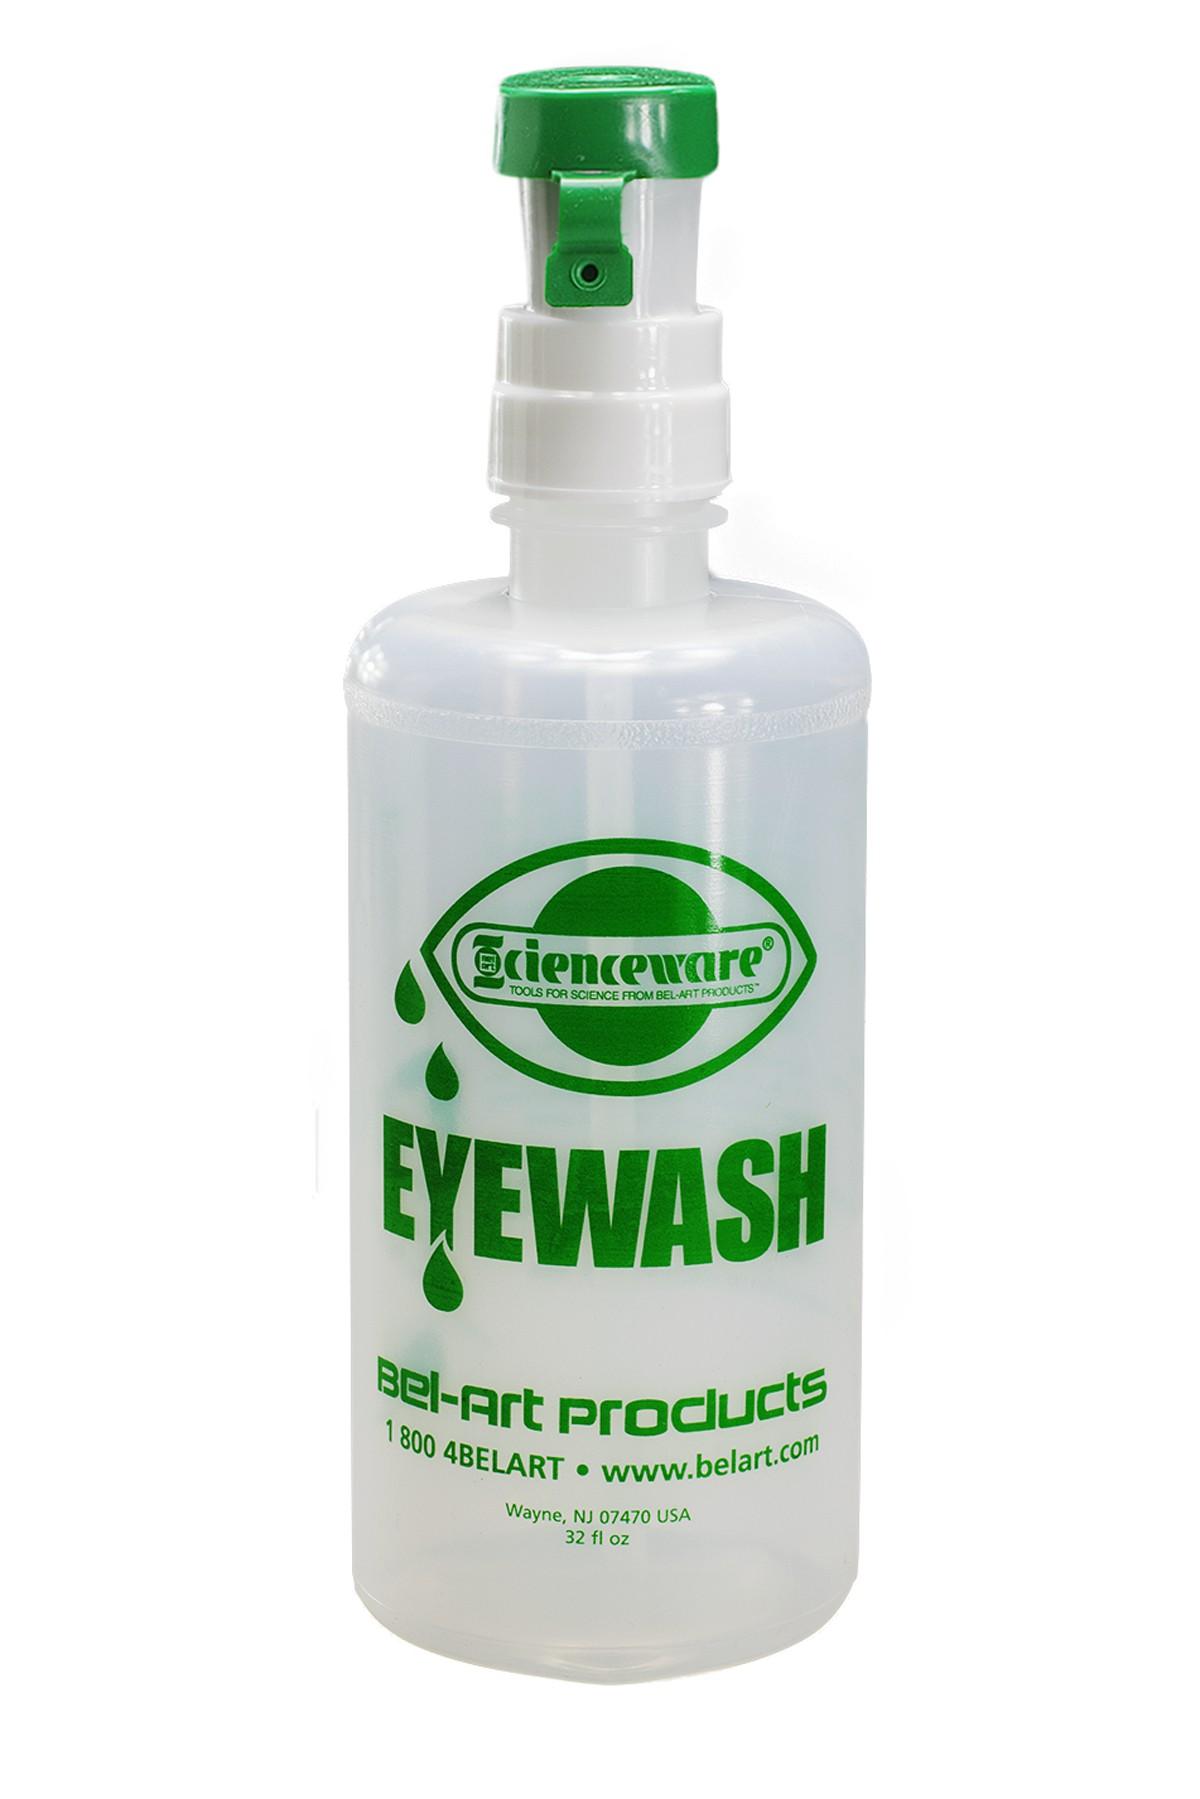 SP Bel-Art Emergency Eye Wash Safety Station Bottle Refill, 1000ml